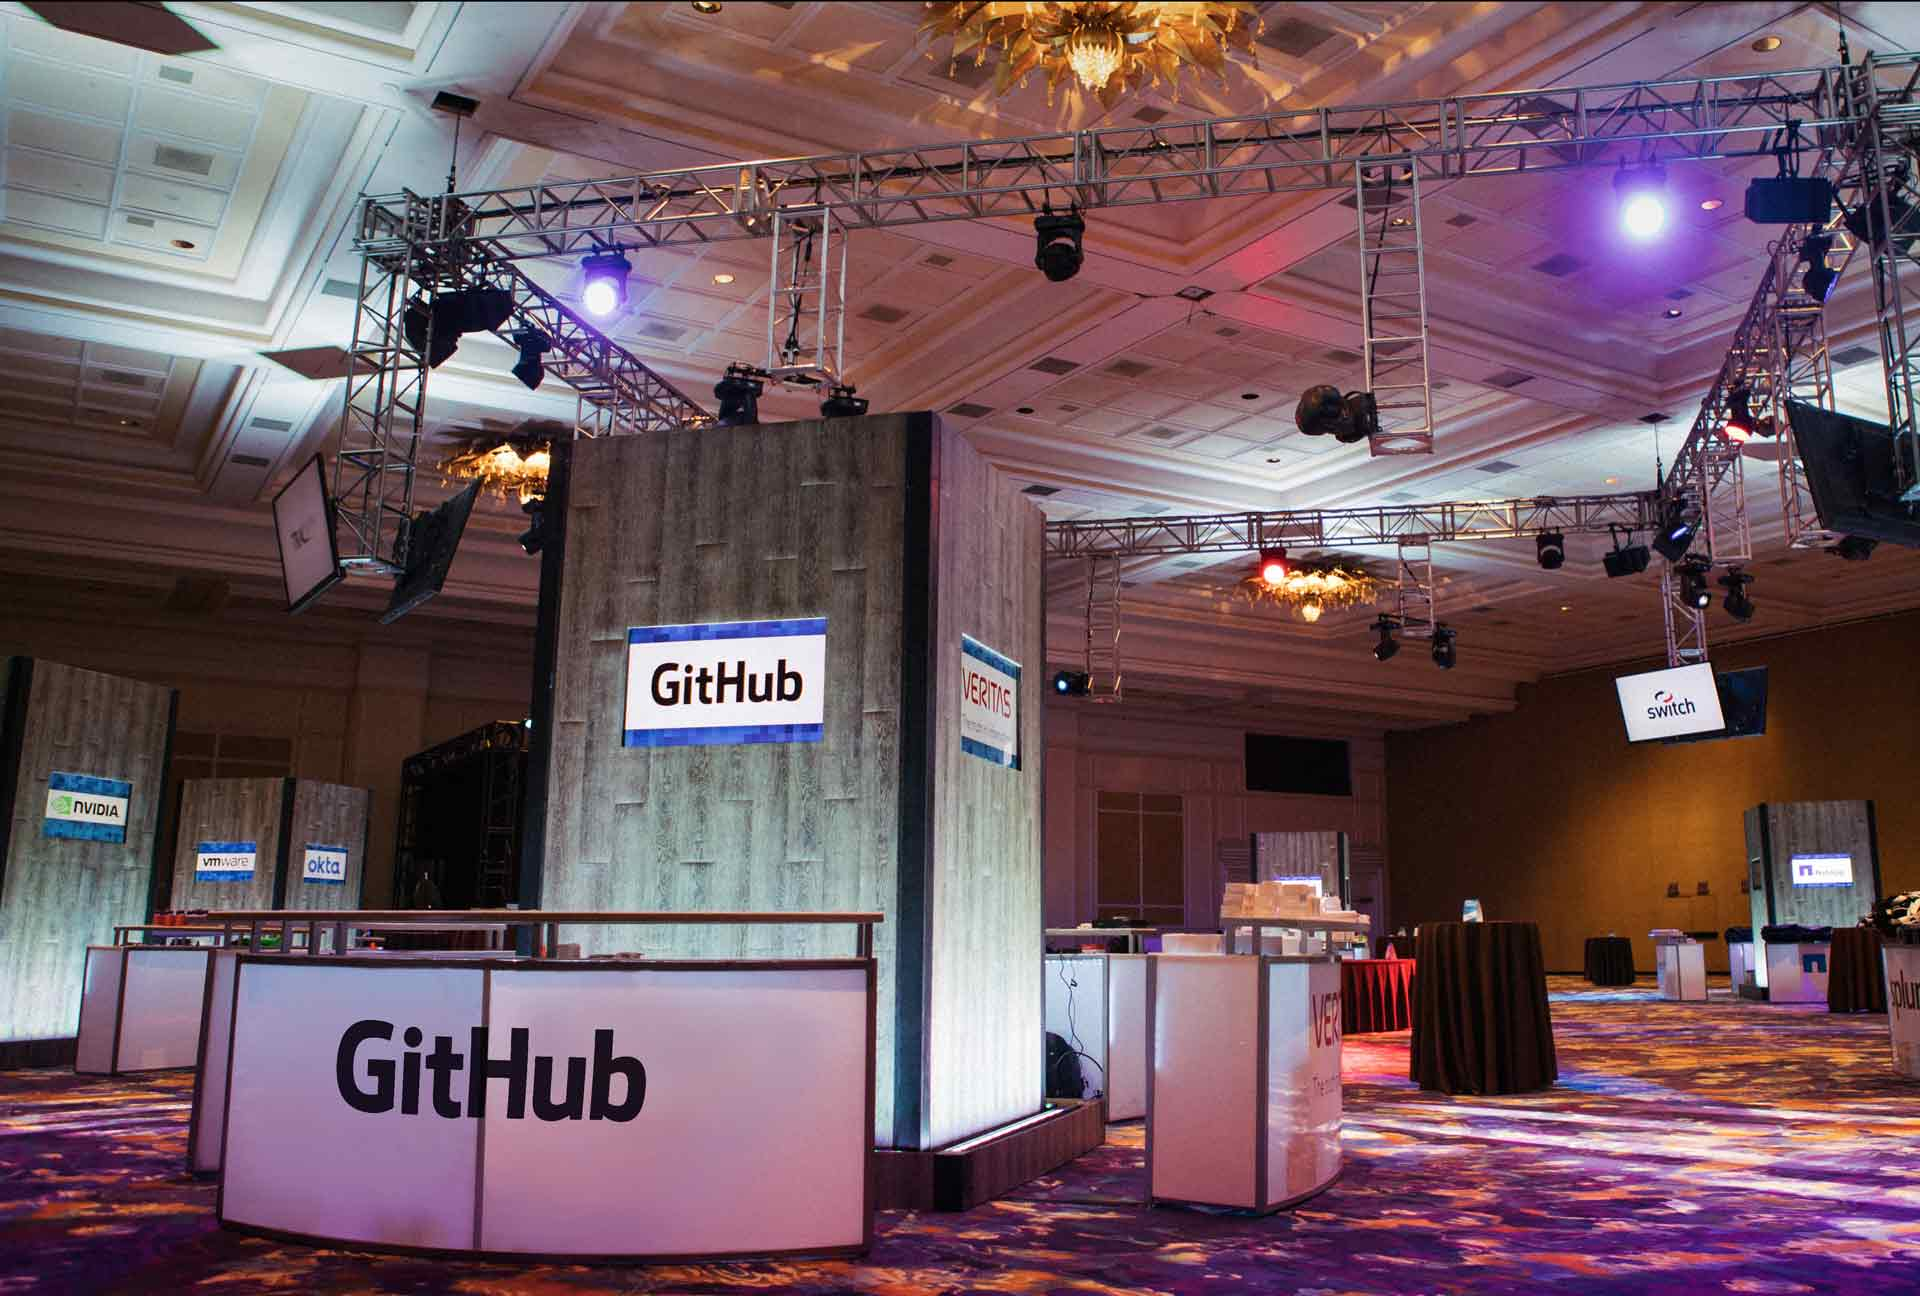 Exhibit-Booth-GitHub-Conference-Exhibitor.jpg